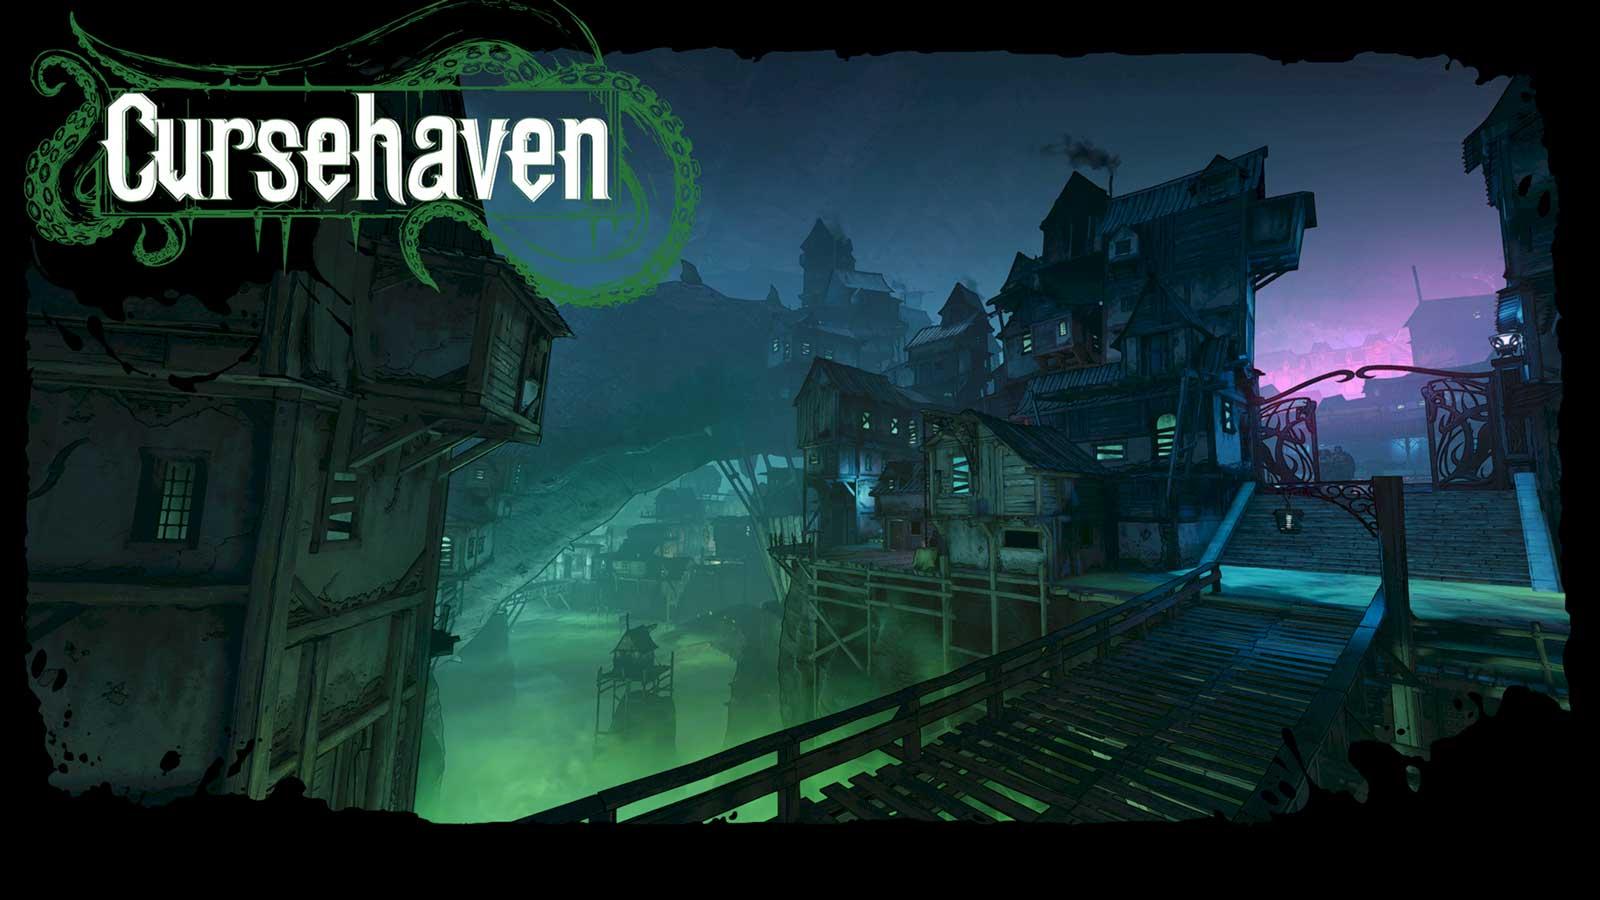 Cursehaven